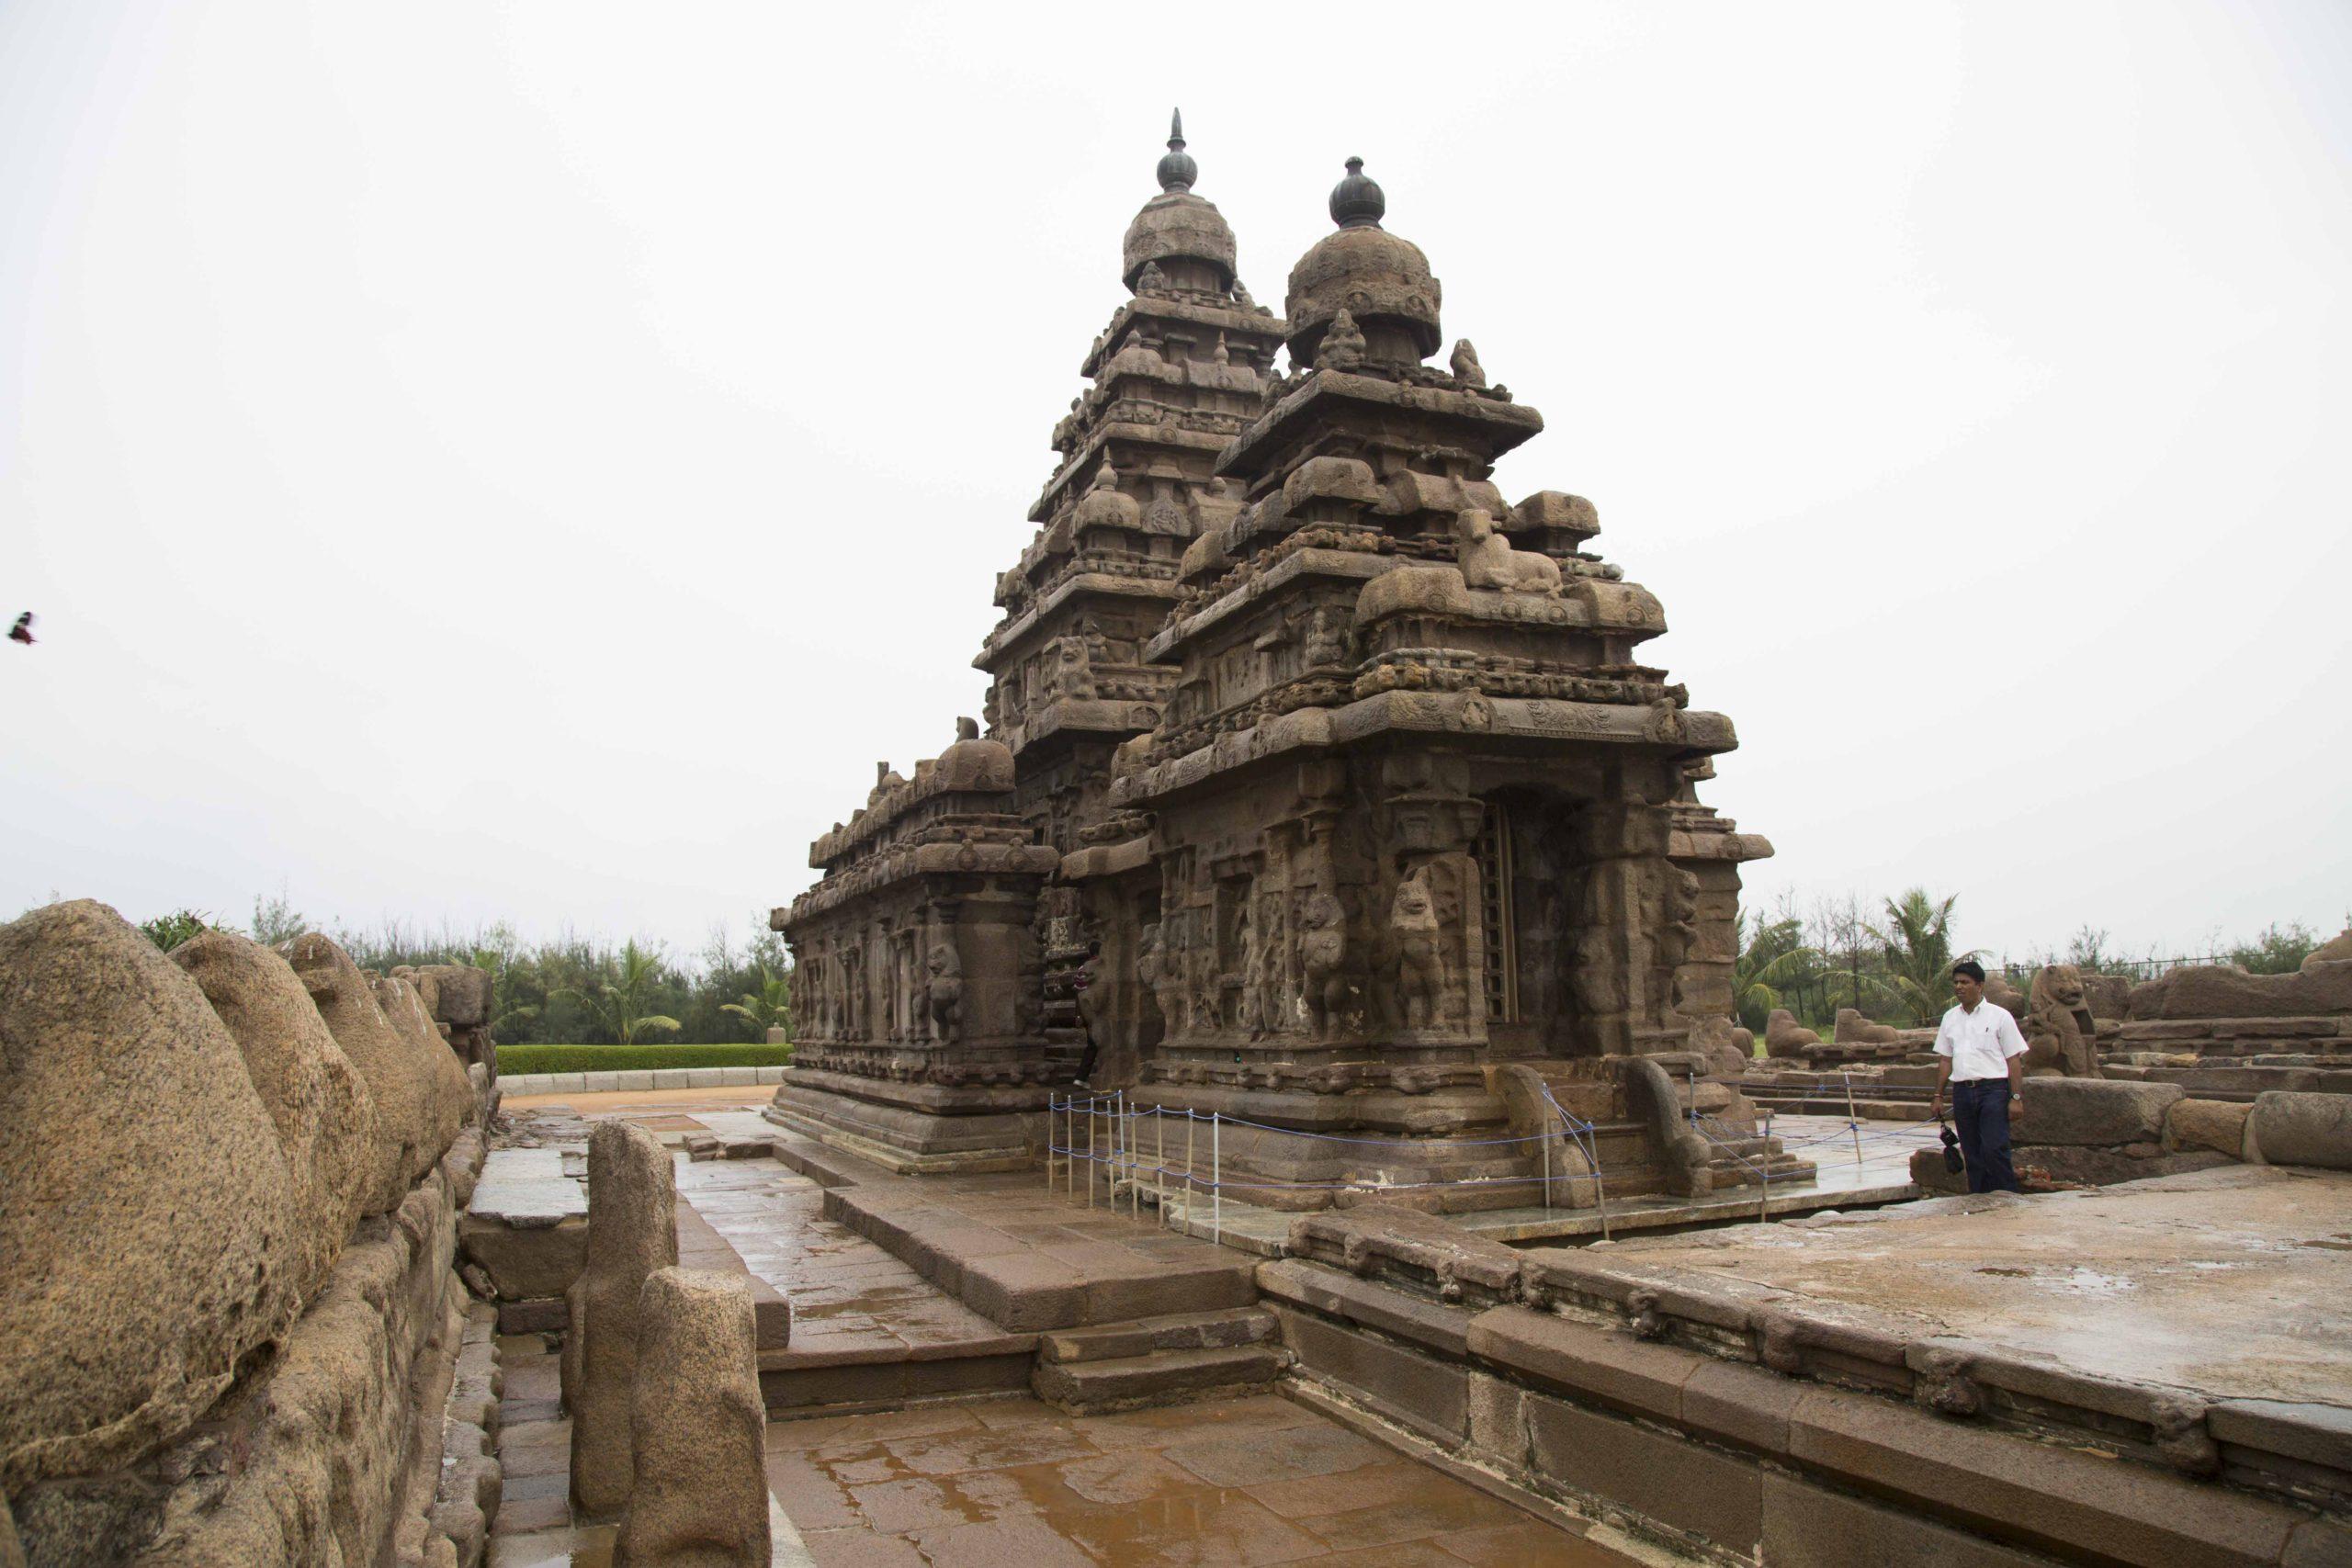 Le complexe des temples de Mahäbalipuram